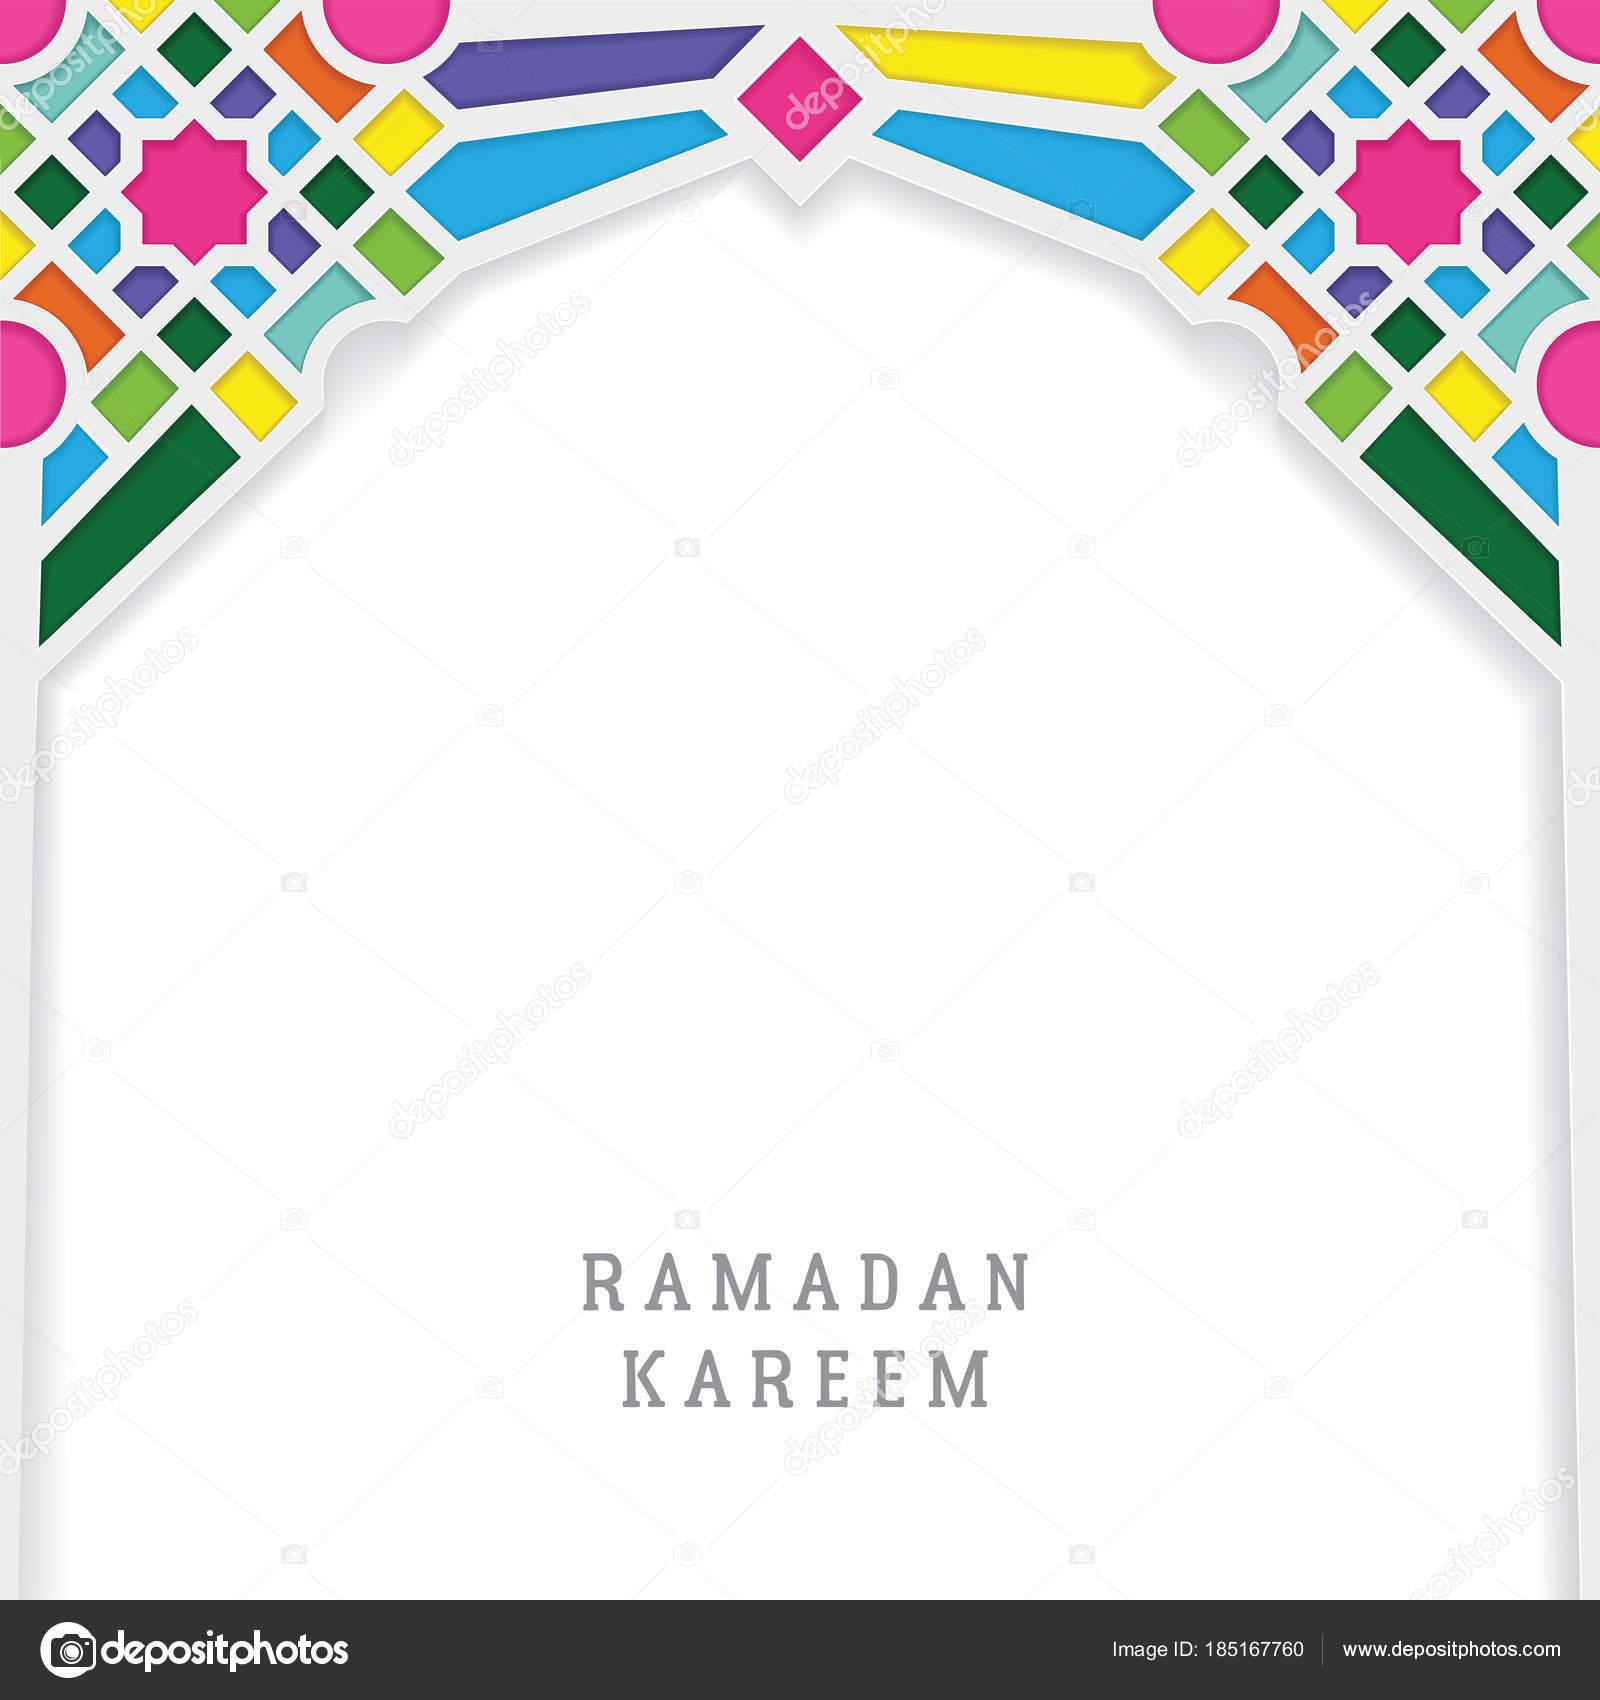 Ramadan Kareem Greeting Card Template Vector Design With Moroccan - Greeting card template